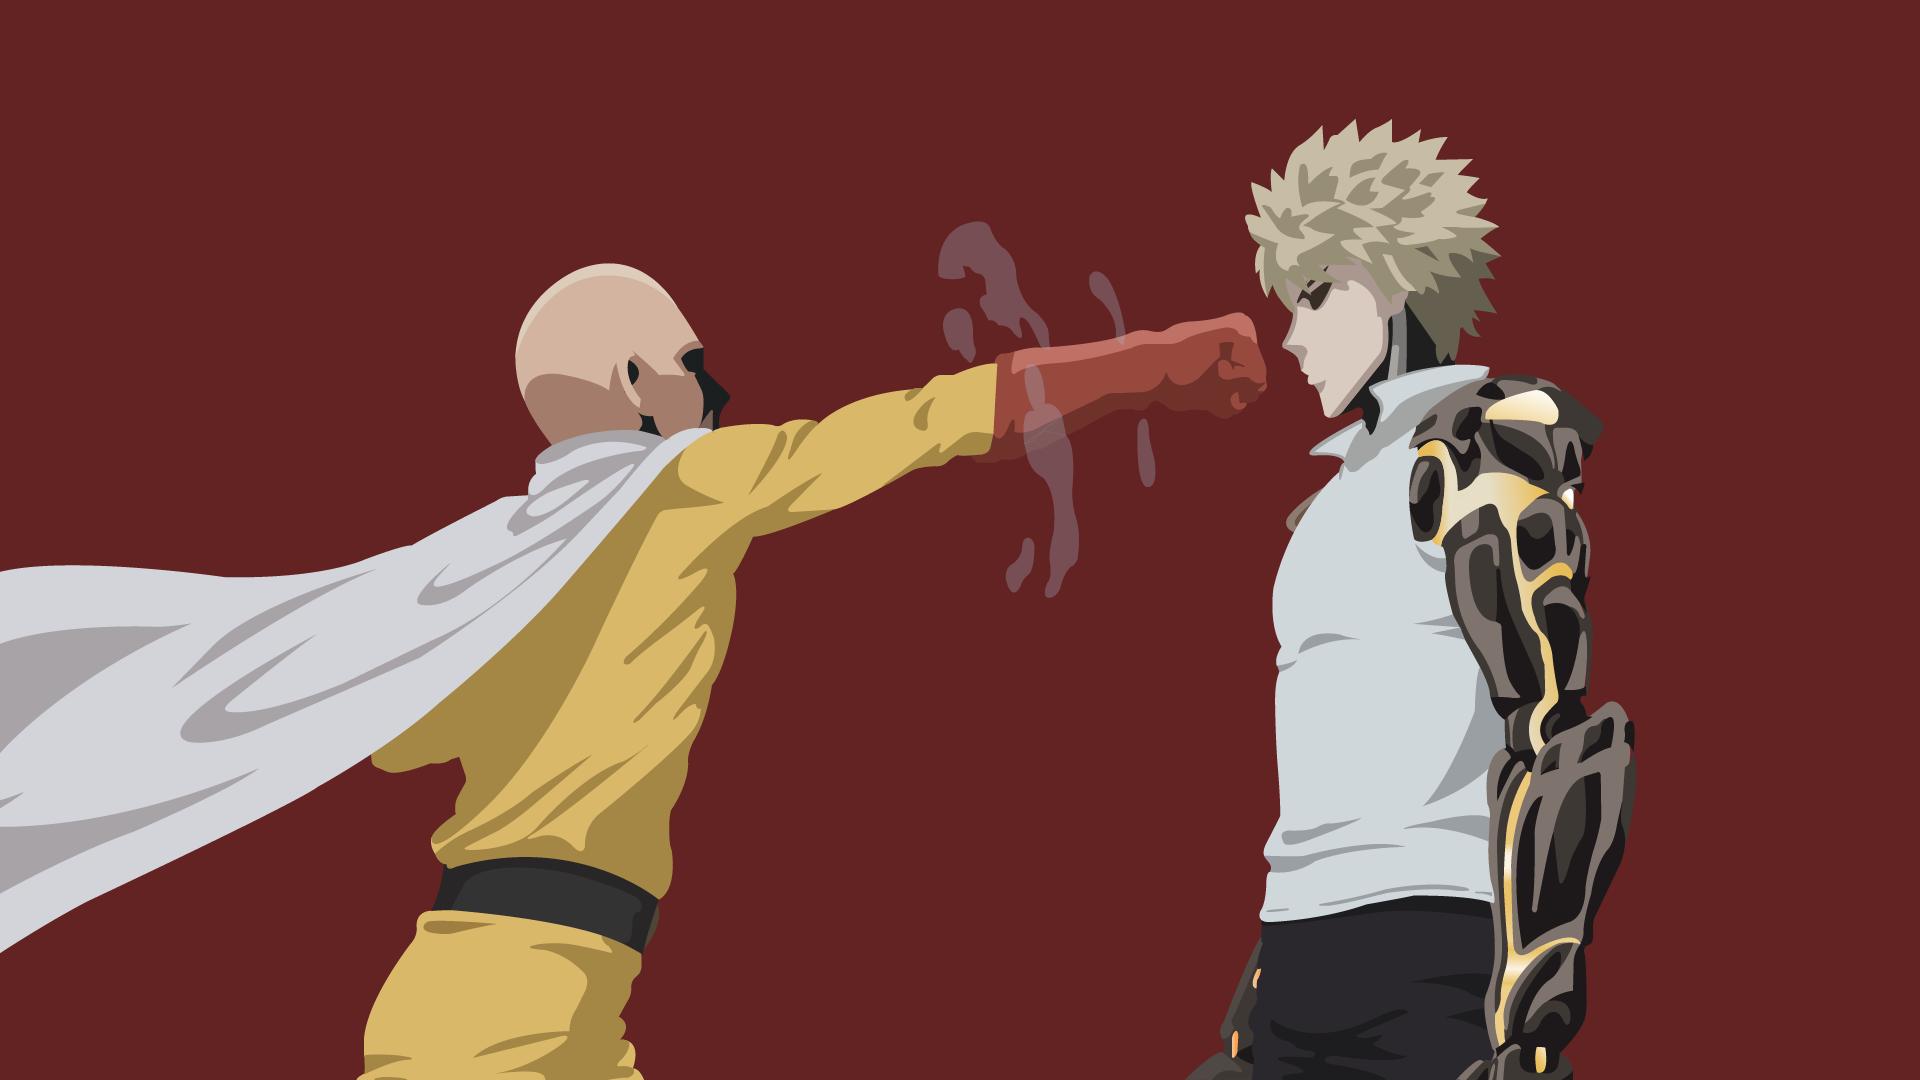 Saitama Genos One Punch Man Wallpaper By Uzumakiash Daily Anime Art